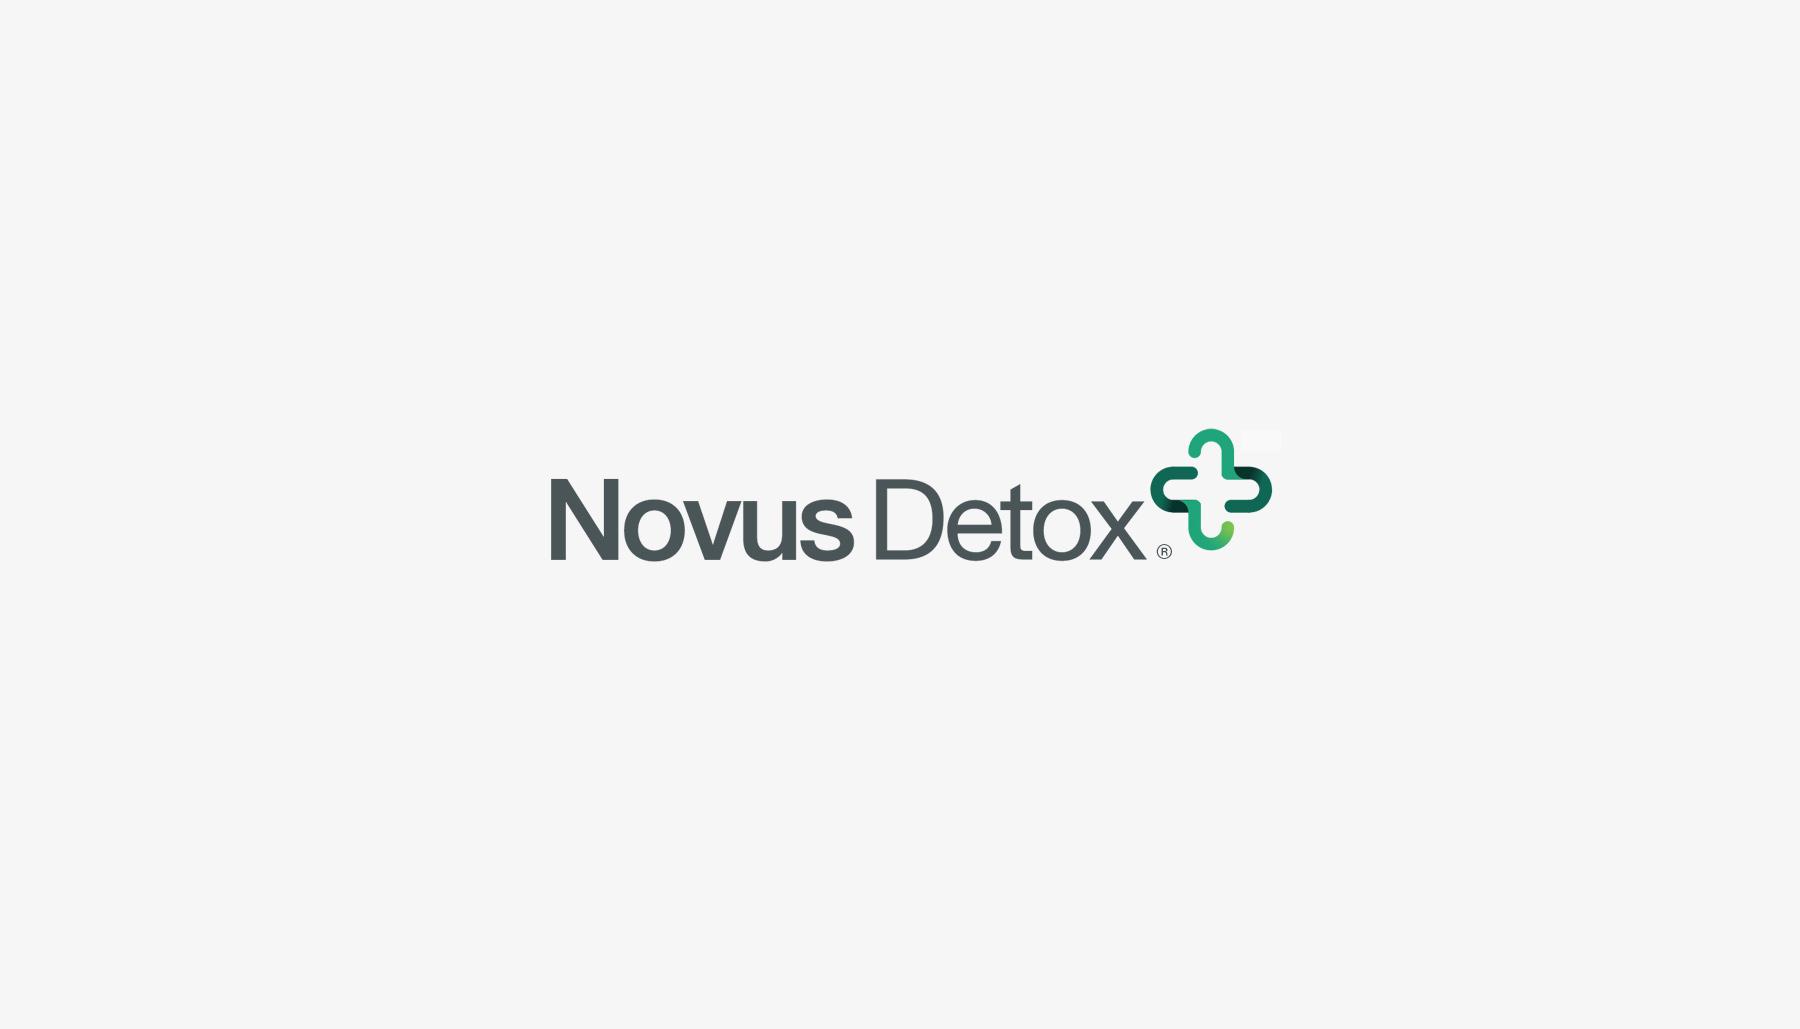 Novus Detox, Florida medical center branding, Tampa Palm Beach healthcare detox brand